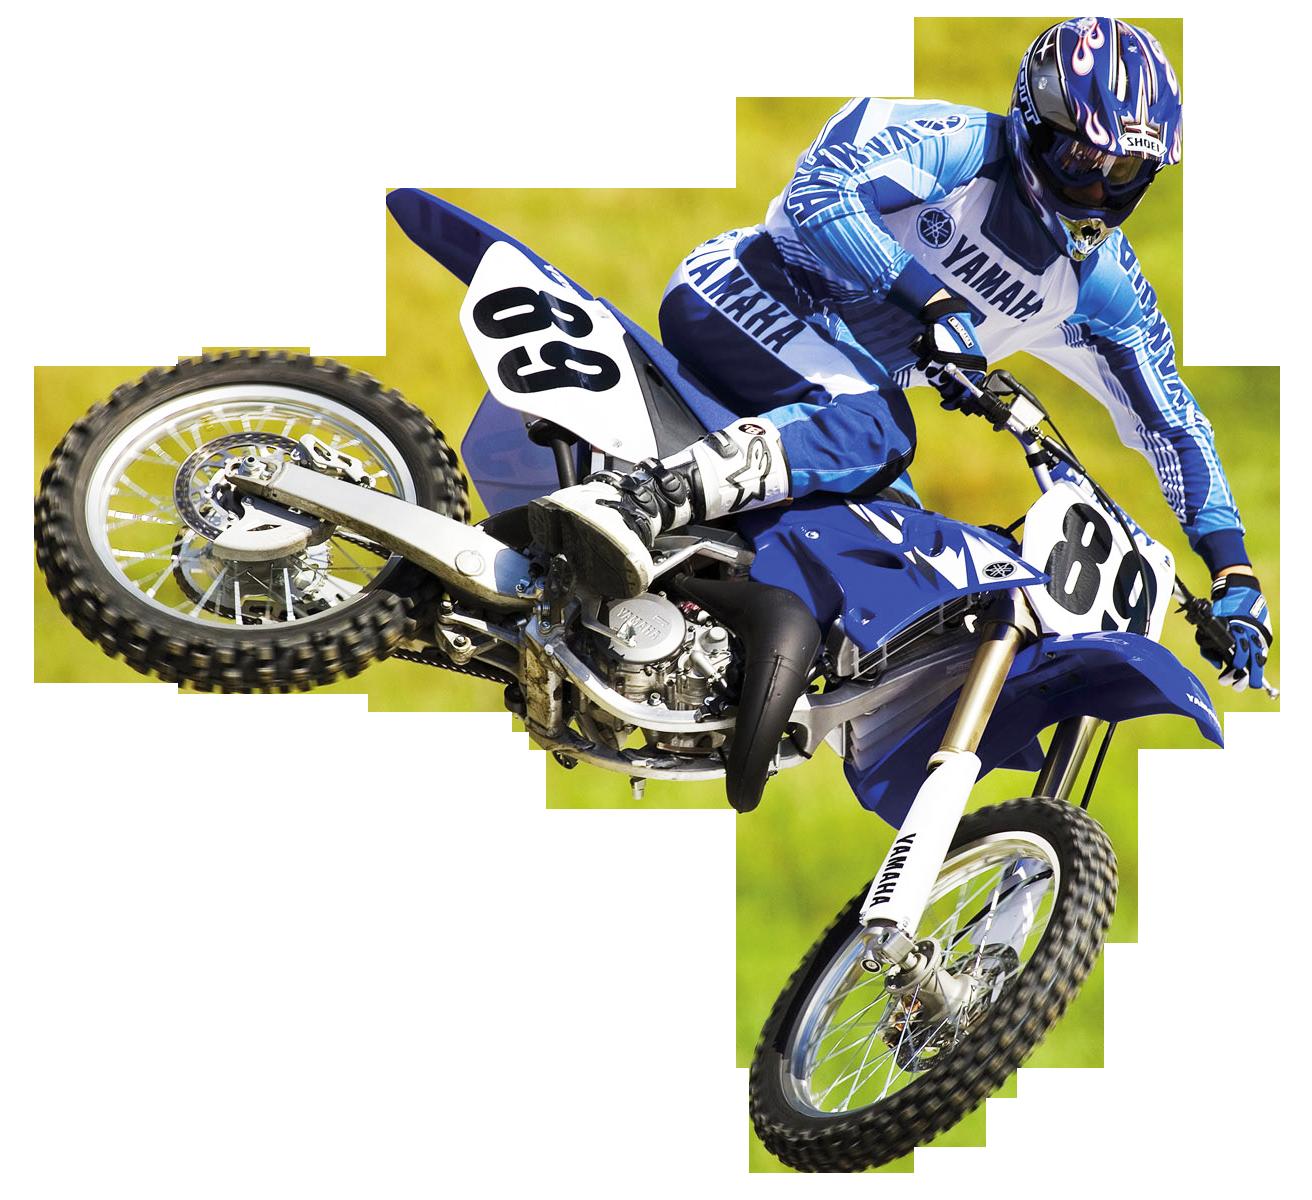 Motor cross clipart clip art download Motocross Racer PNG Image - PurePNG | Free transparent CC0 PNG Image ... clip art download